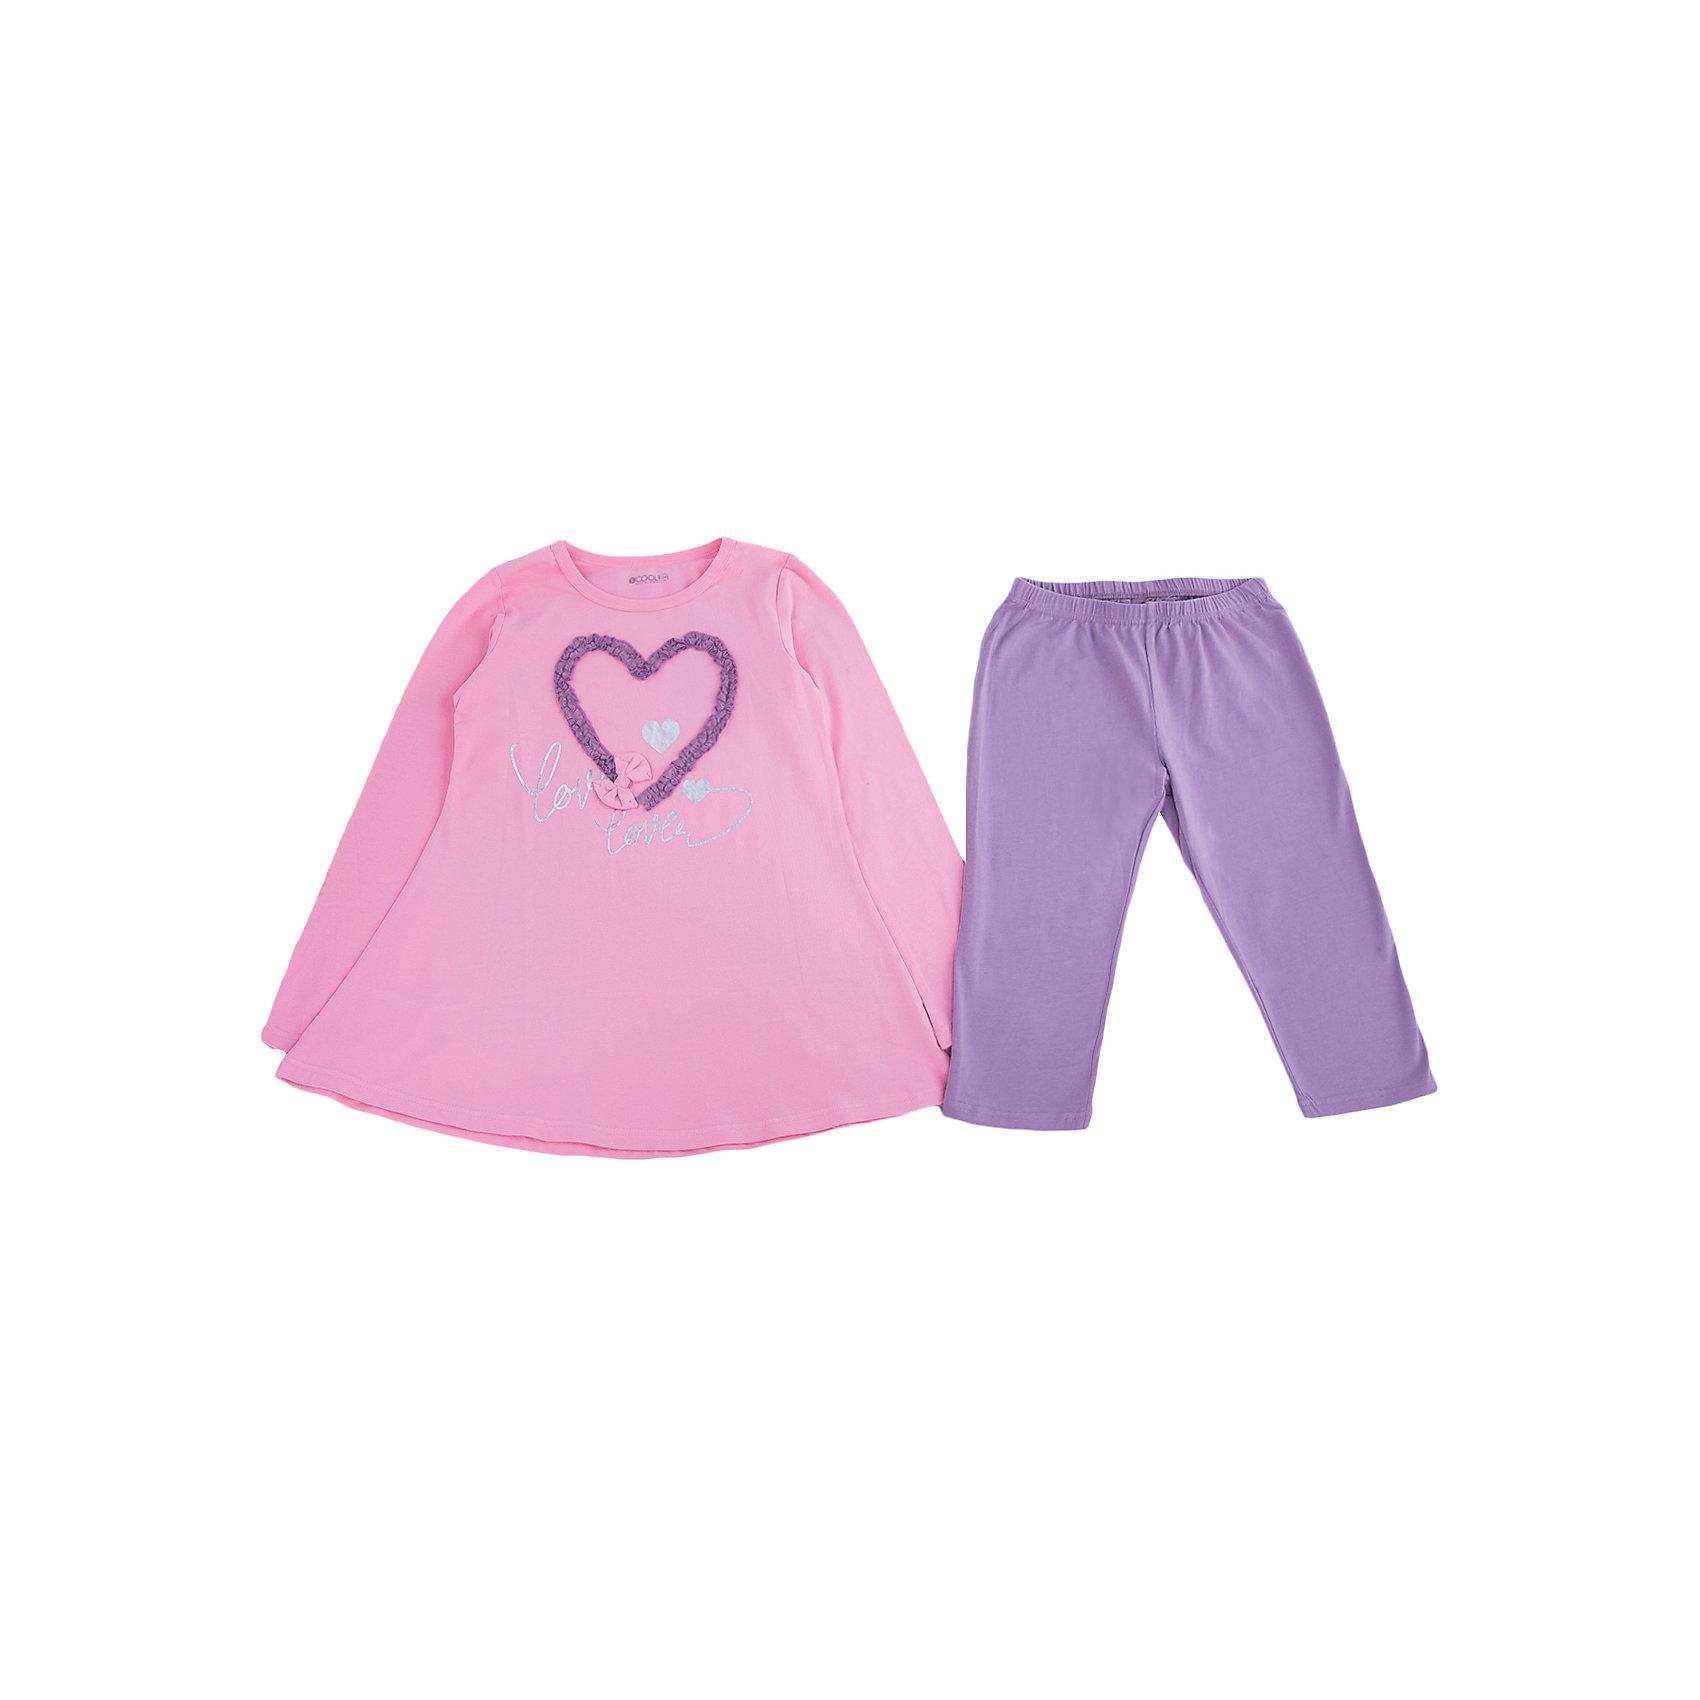 S'cool Комплект: туника и леггинсы для девочки S'cool костюмы wonderkids туника леггинсы